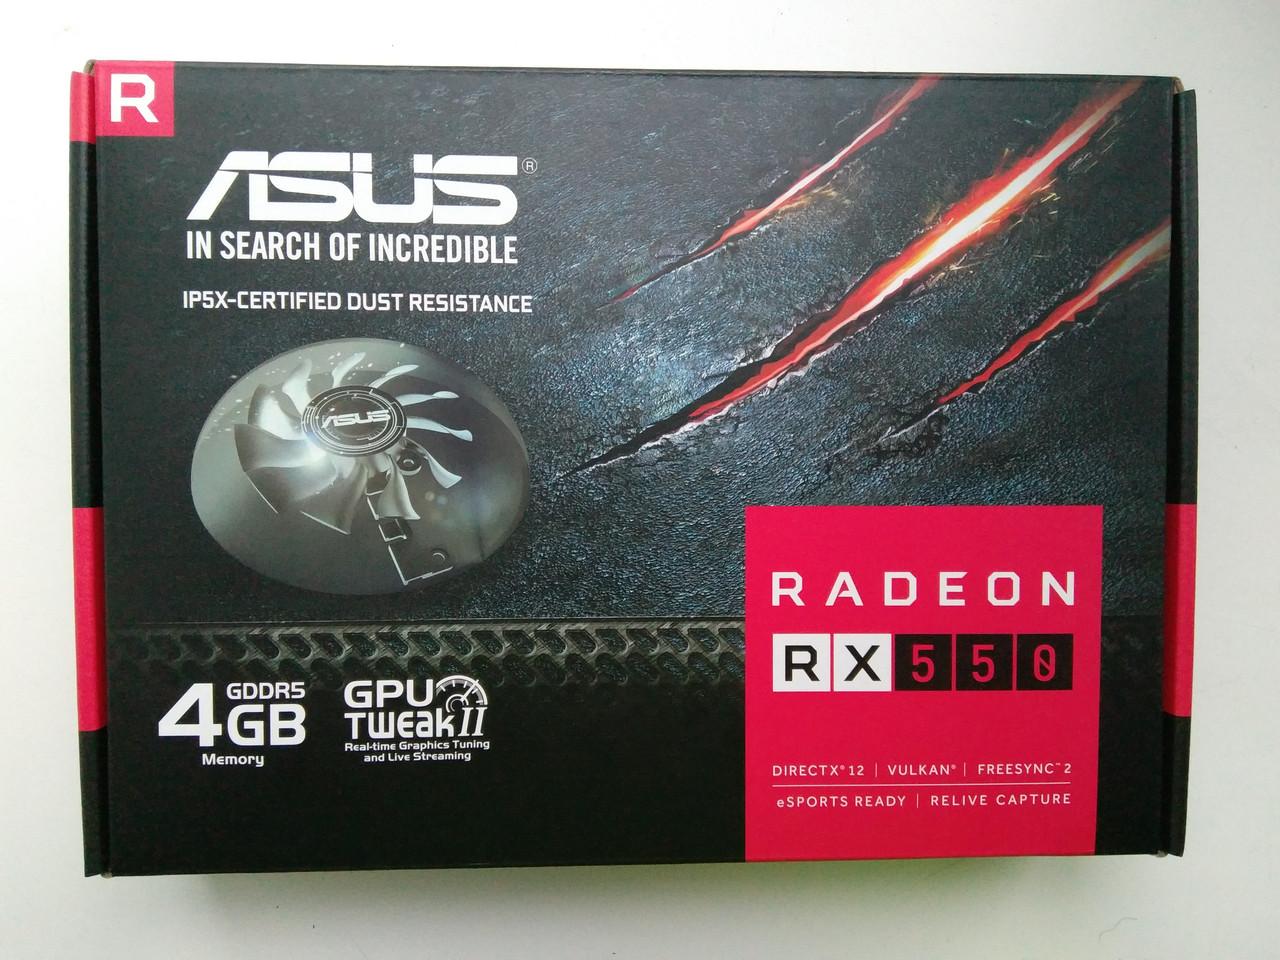 Видеокарта Asus Radeon RX 550 (RX550-4G)